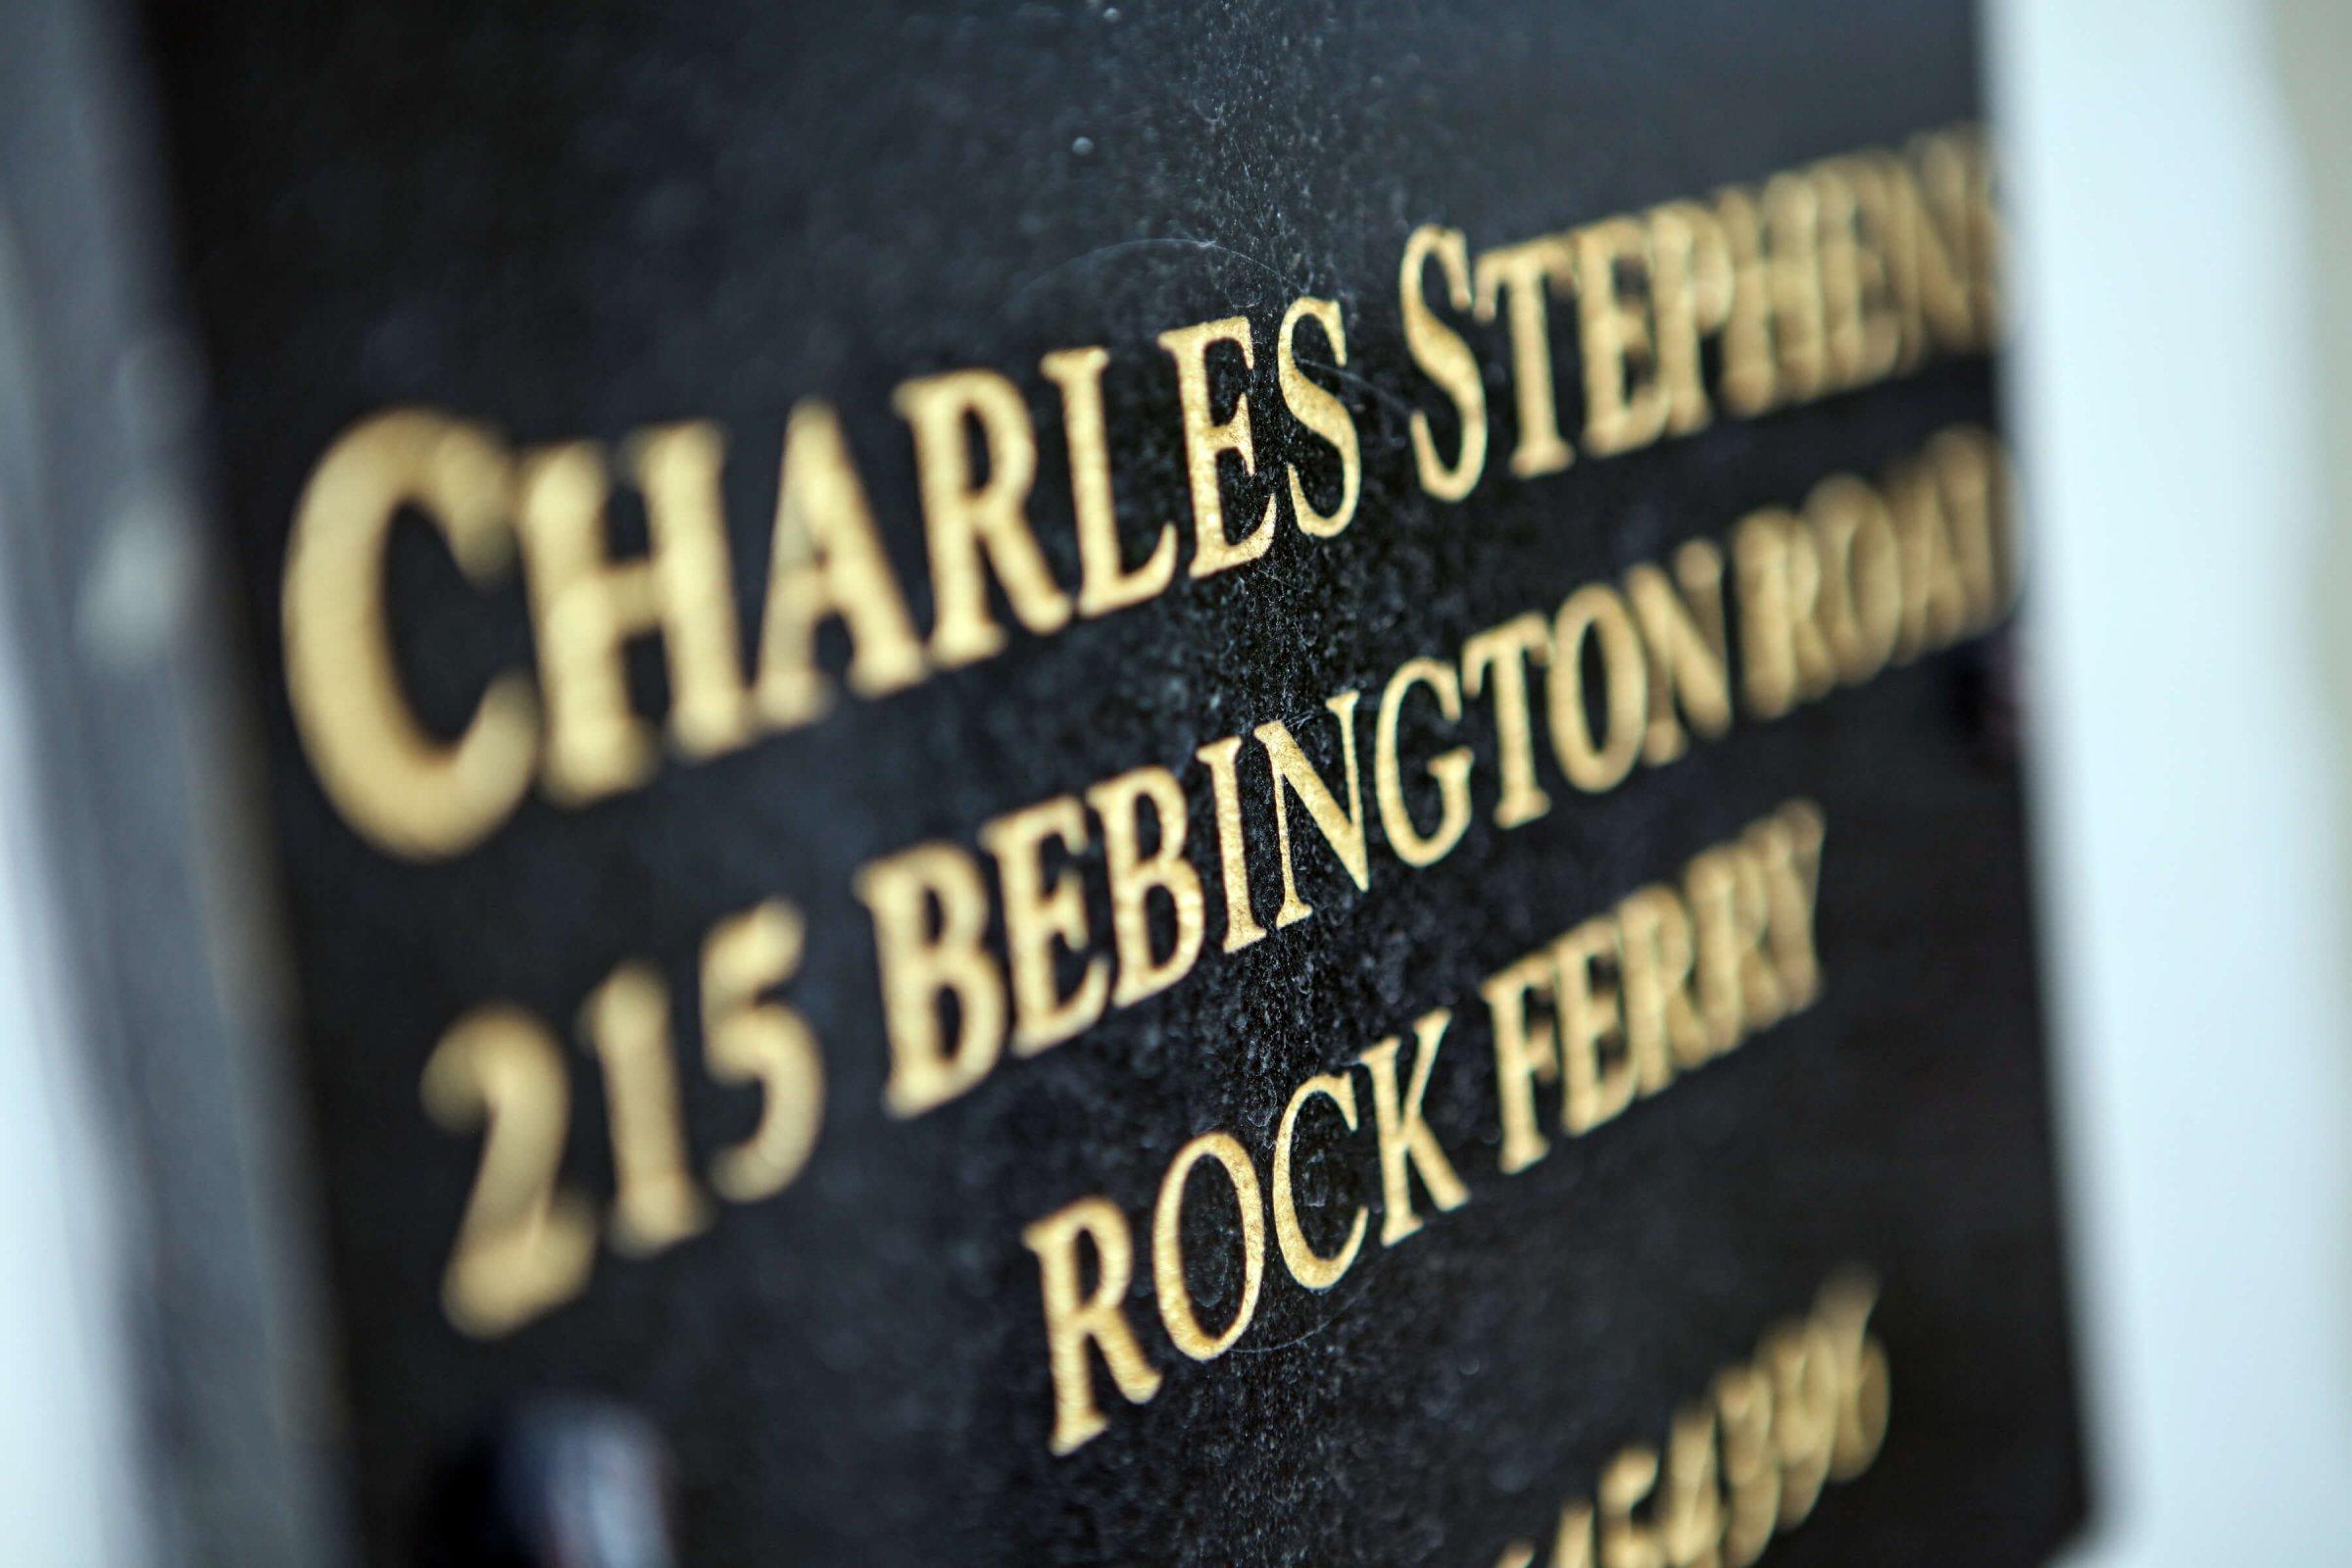 Charles Stephens Masonry